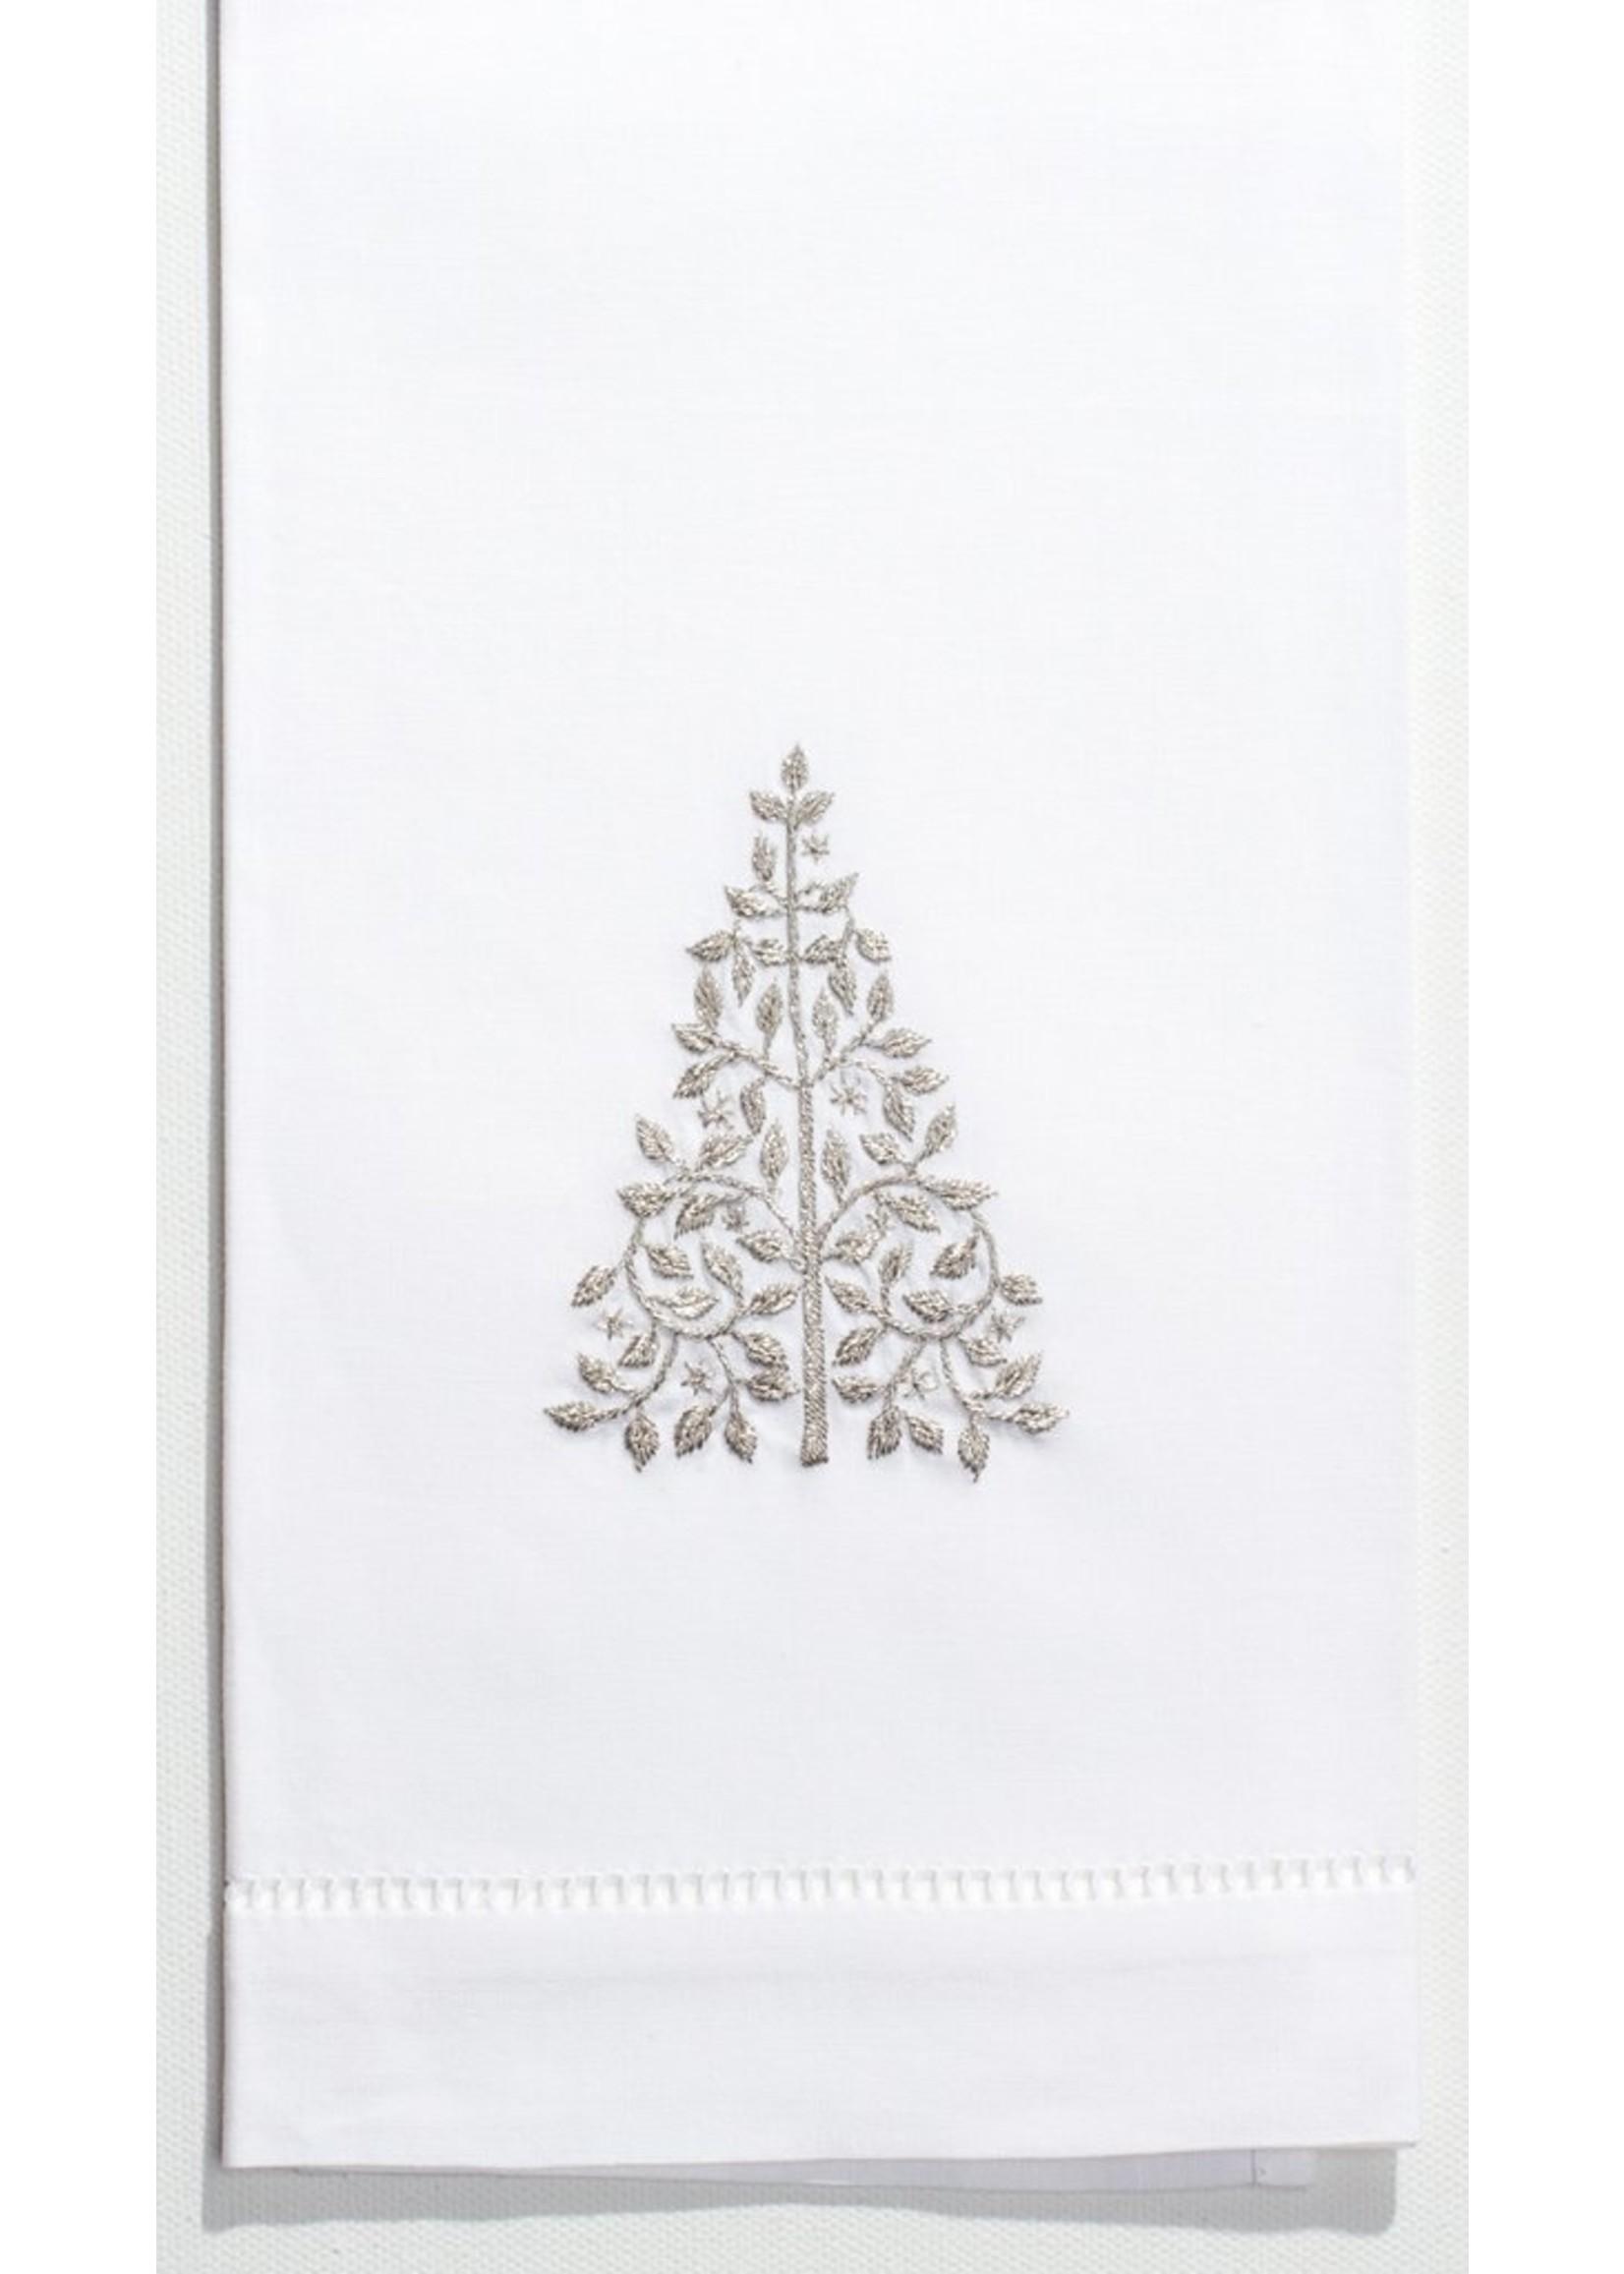 Henry Handwork Towel - Mod Tree Silver